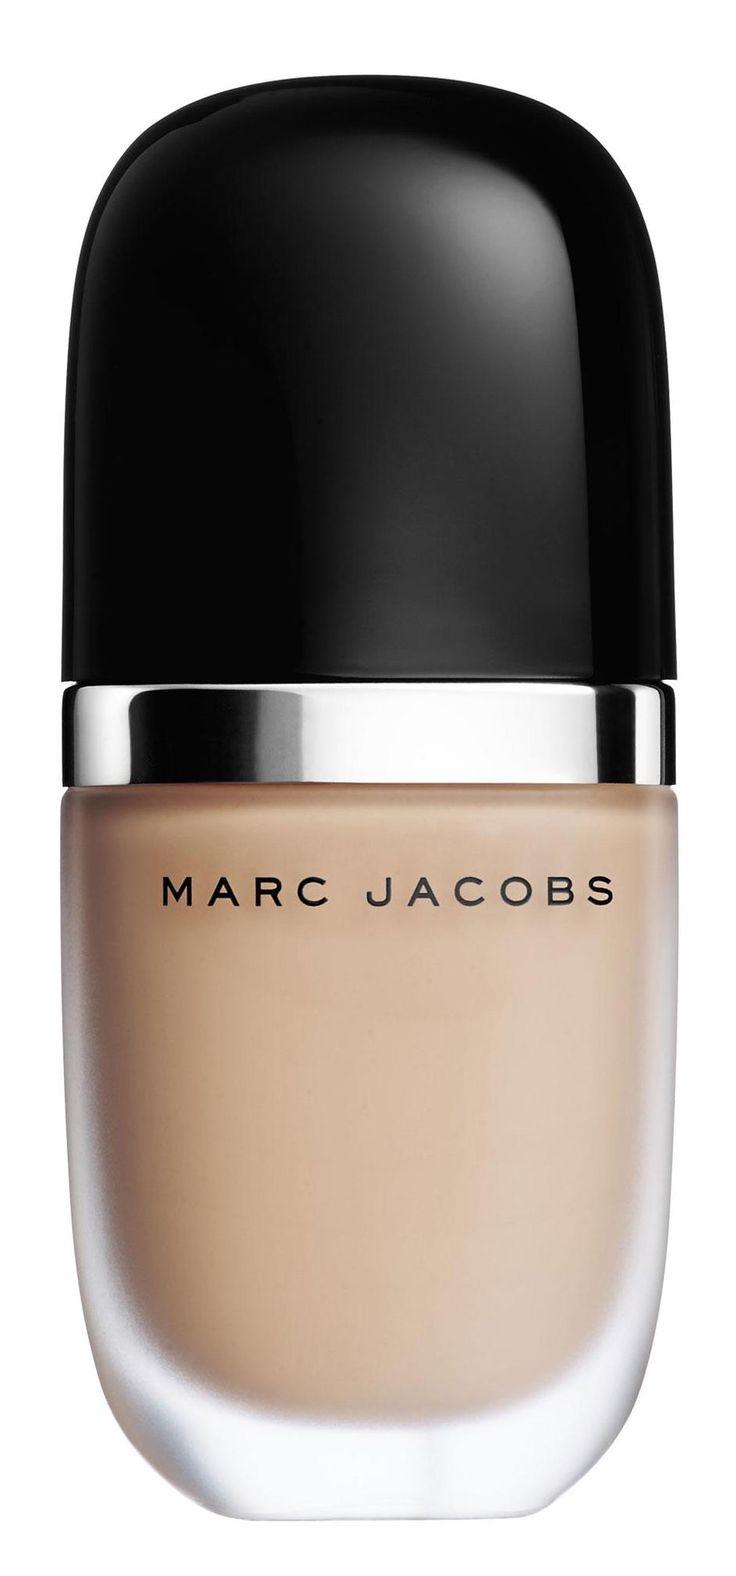 Marc Jacobs - Genius Gel Supercharged Foundation in Beige Deep (38)